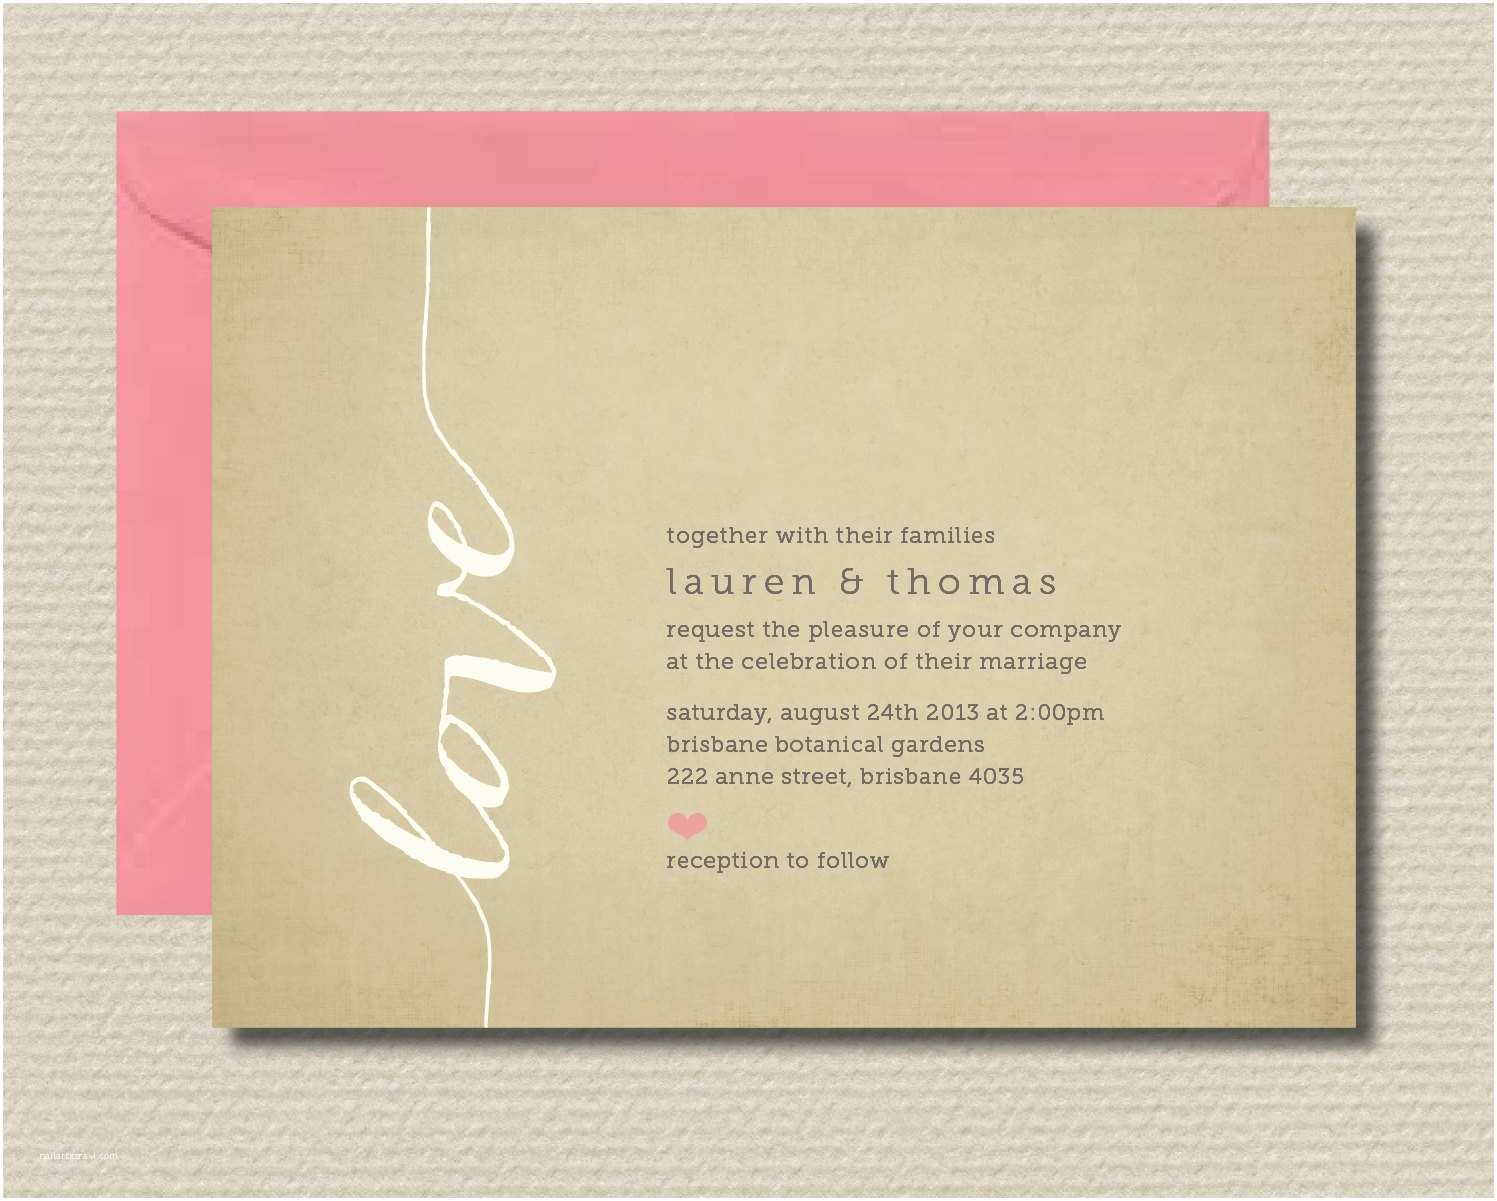 Wedding Invitations and Rsvp Cards Wedding Invitation Wording Wedding Invitation Wording